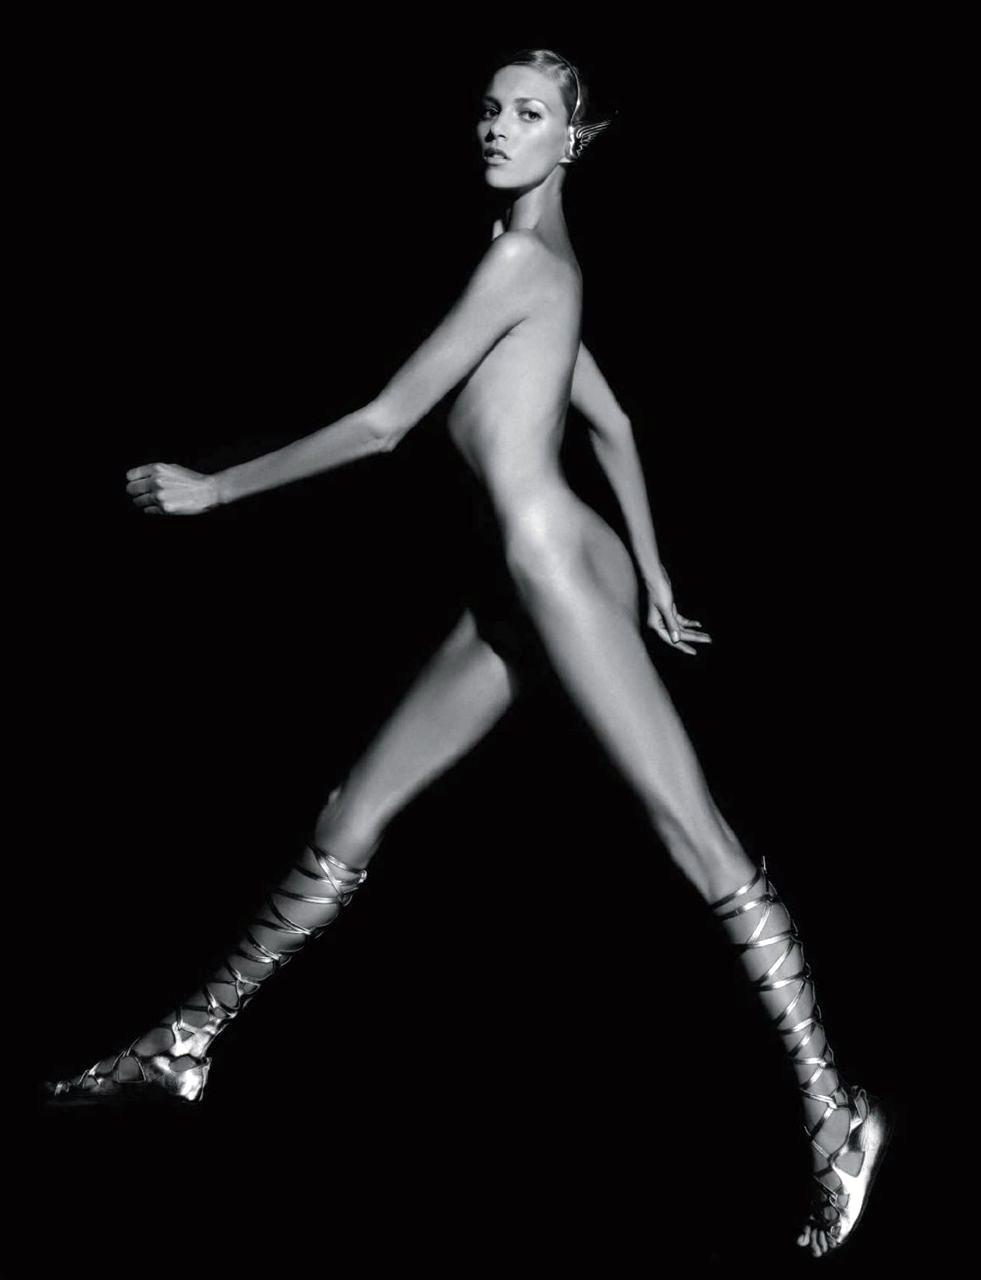 Anja_Rubik-Karl_Lagerfeld-shrbr.jpeg